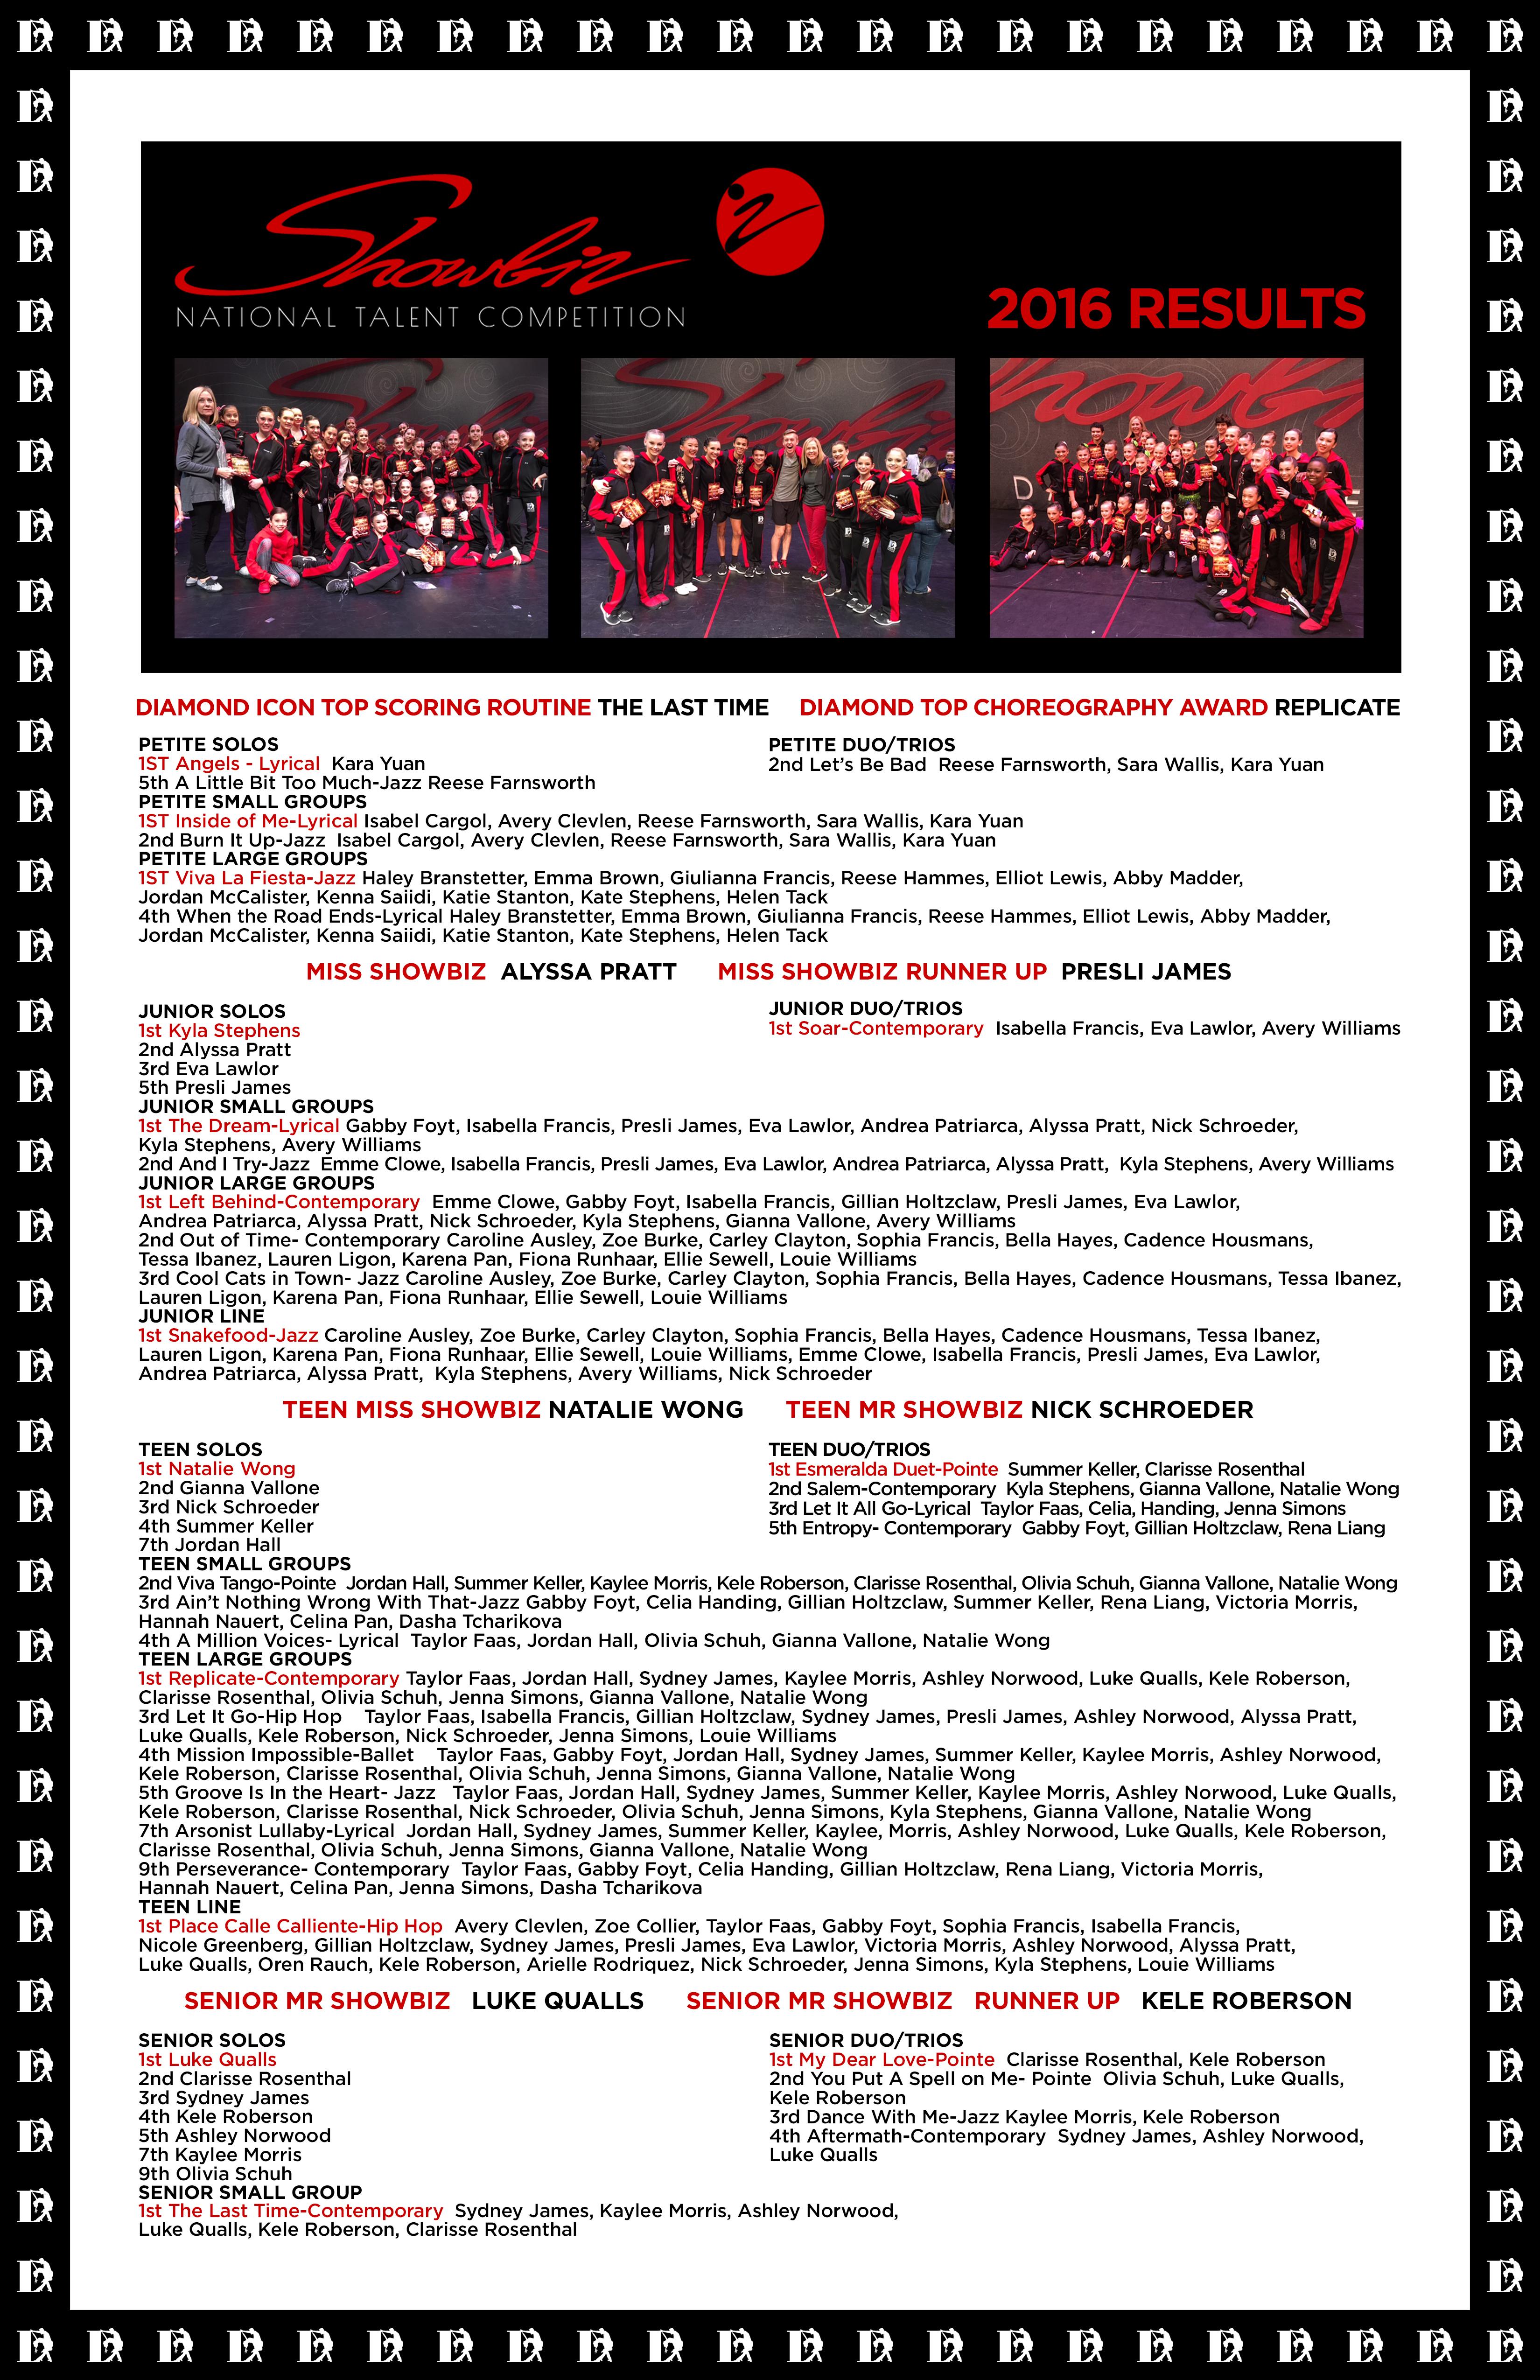 Showbiz 2016 Results(2).jpg